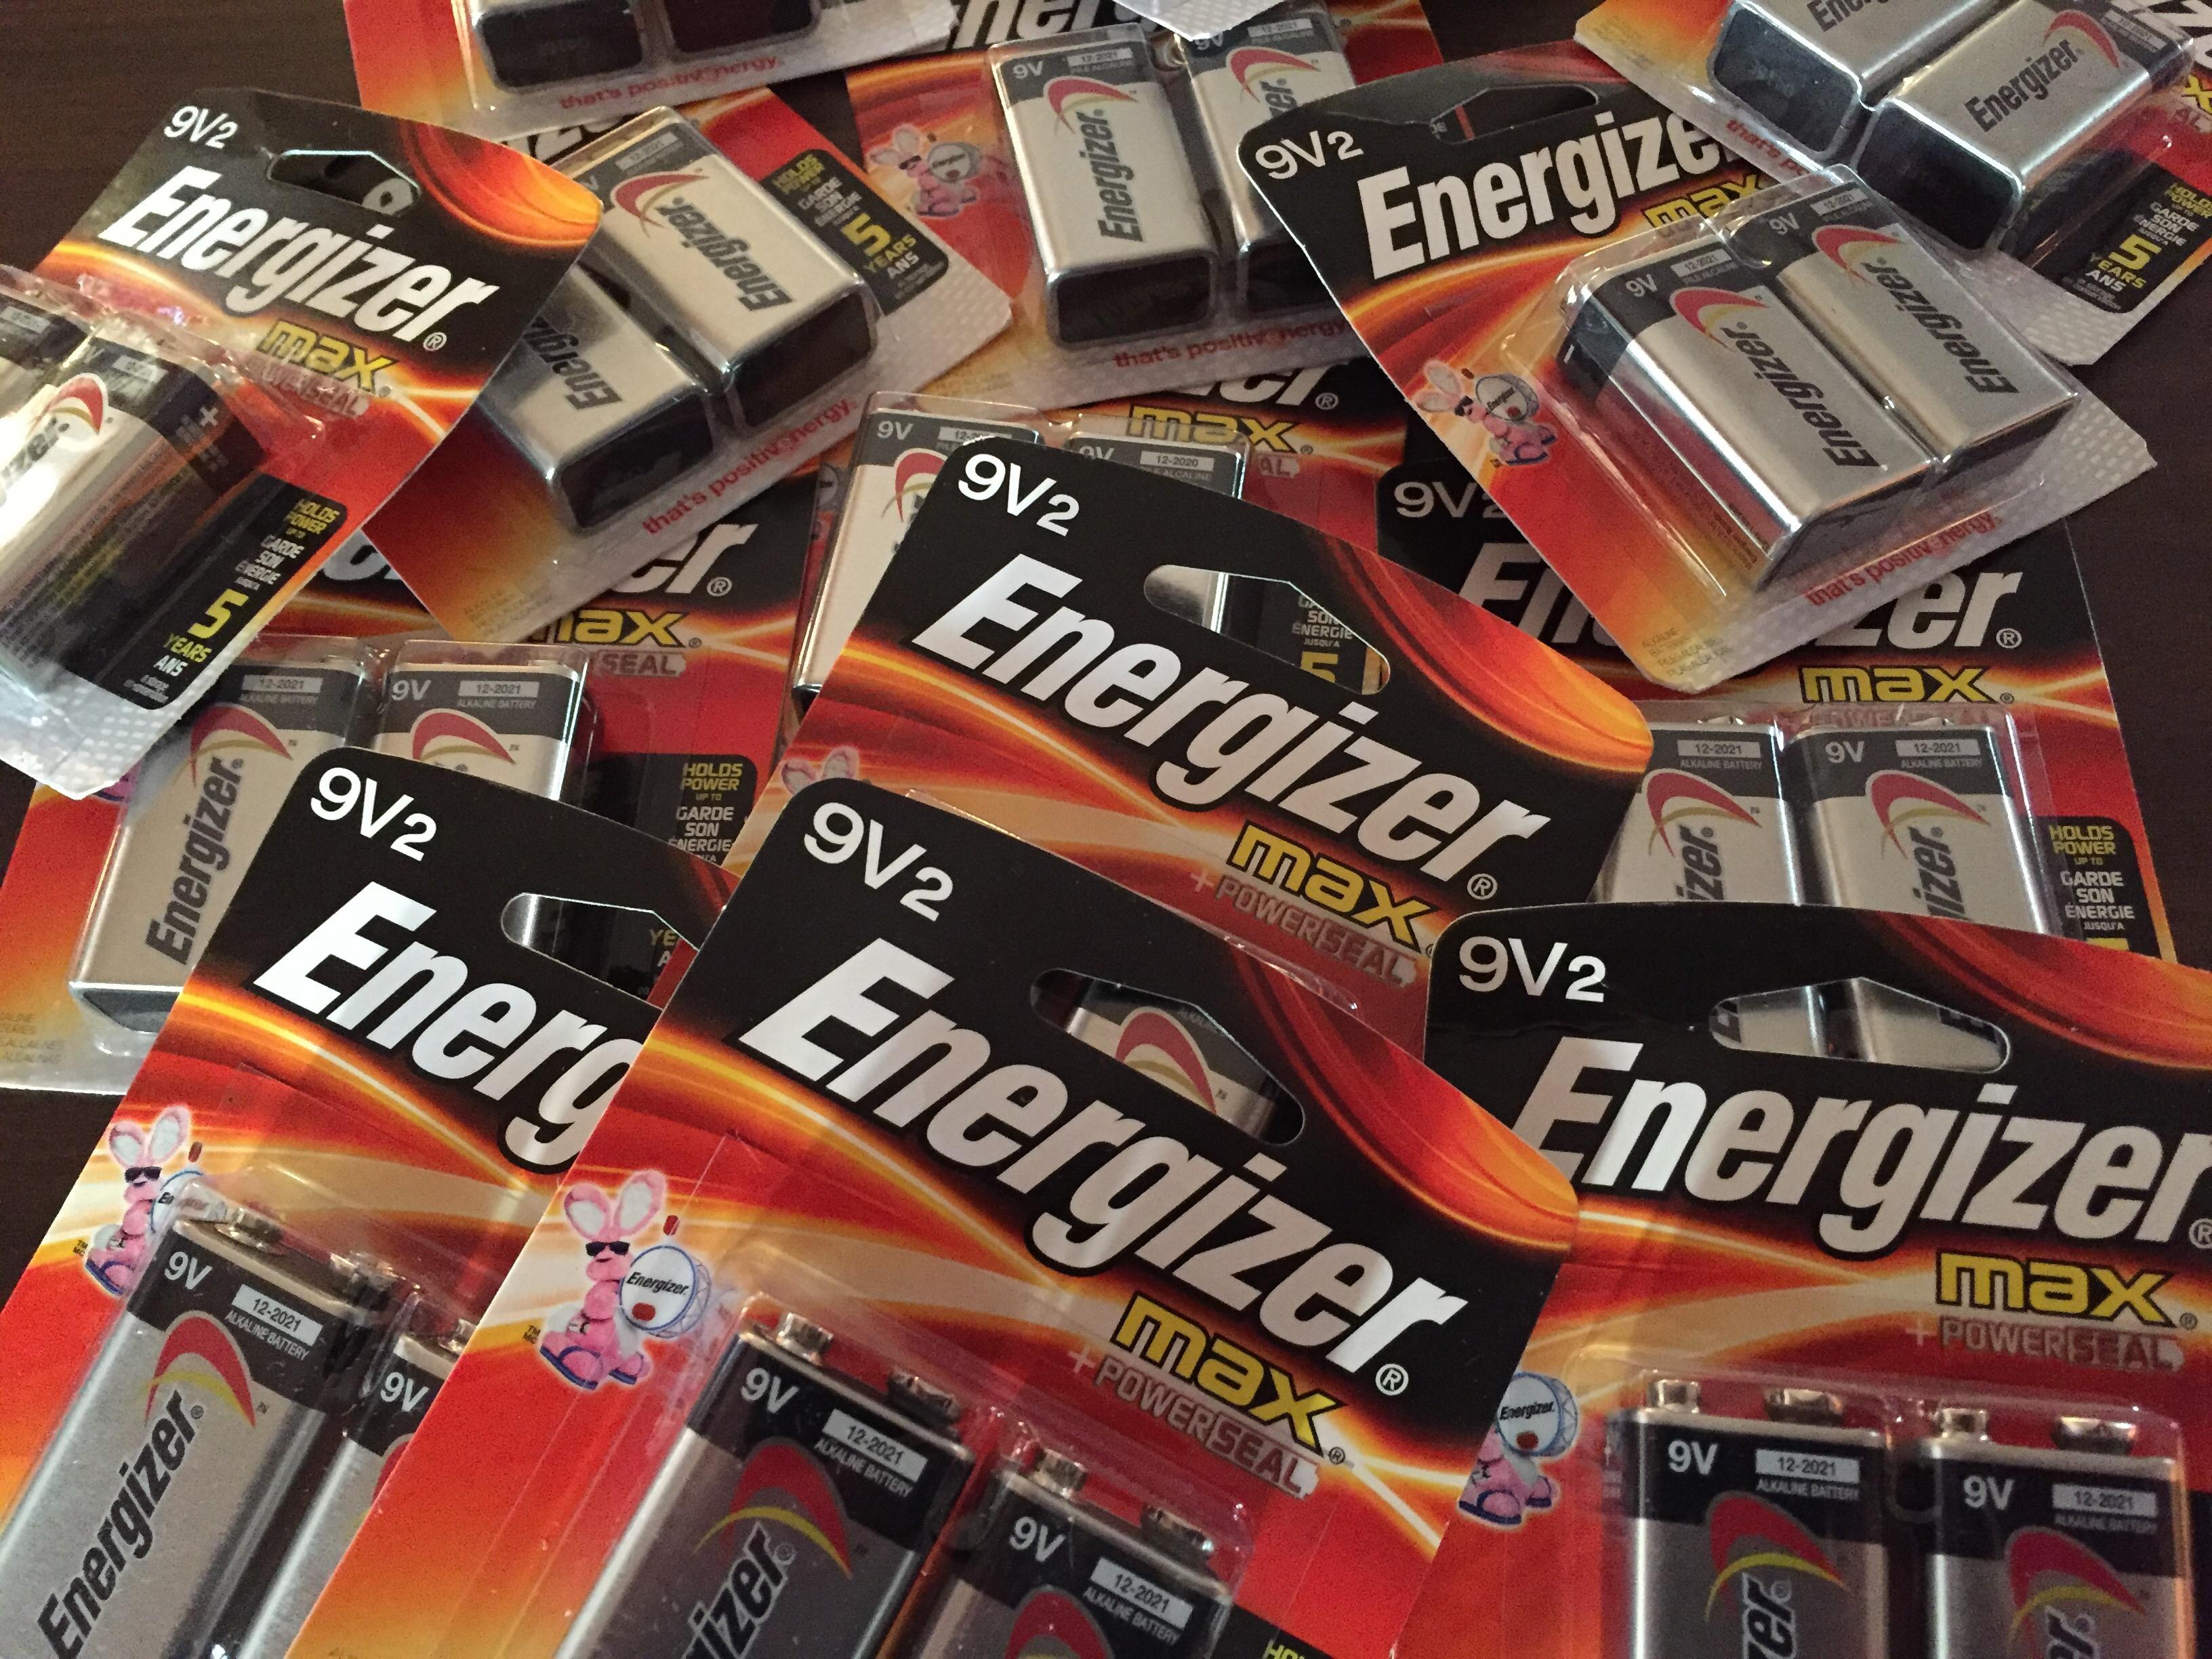 Free Batteries for Smoke Detectors